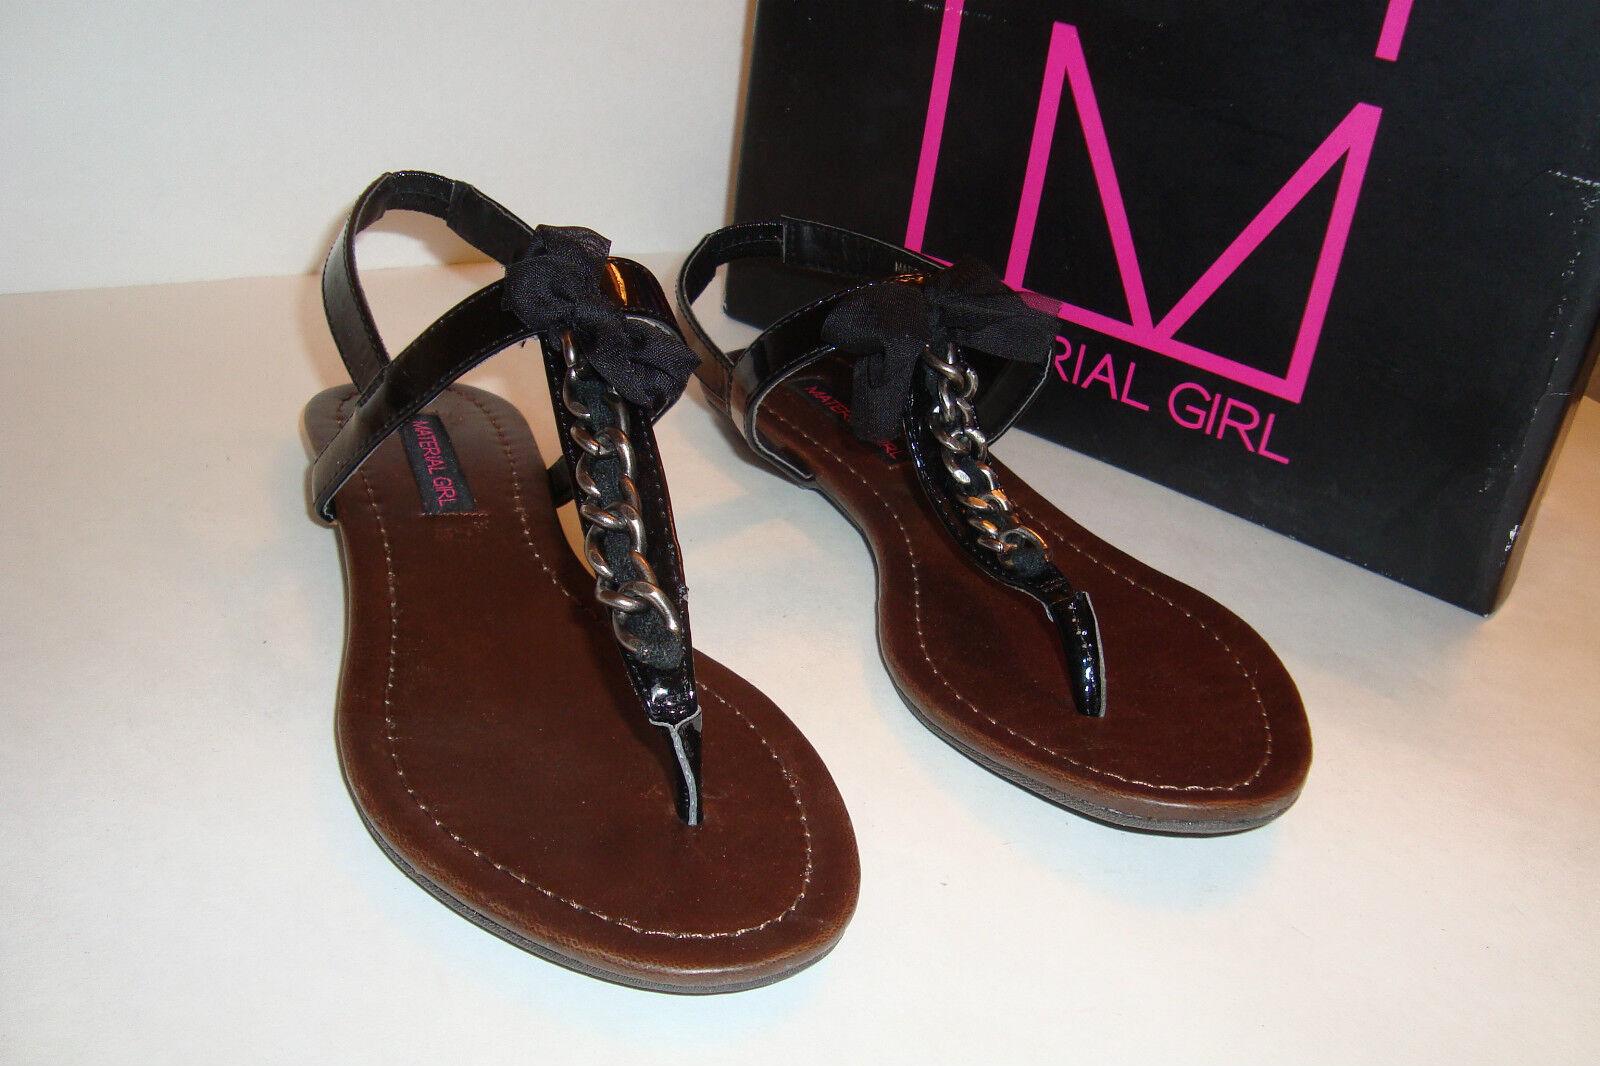 Material Girl mujer NWB NWB NWB Hielo Negro Patente Sandalias Zapatos 6 MED Nuevo  compras en linea